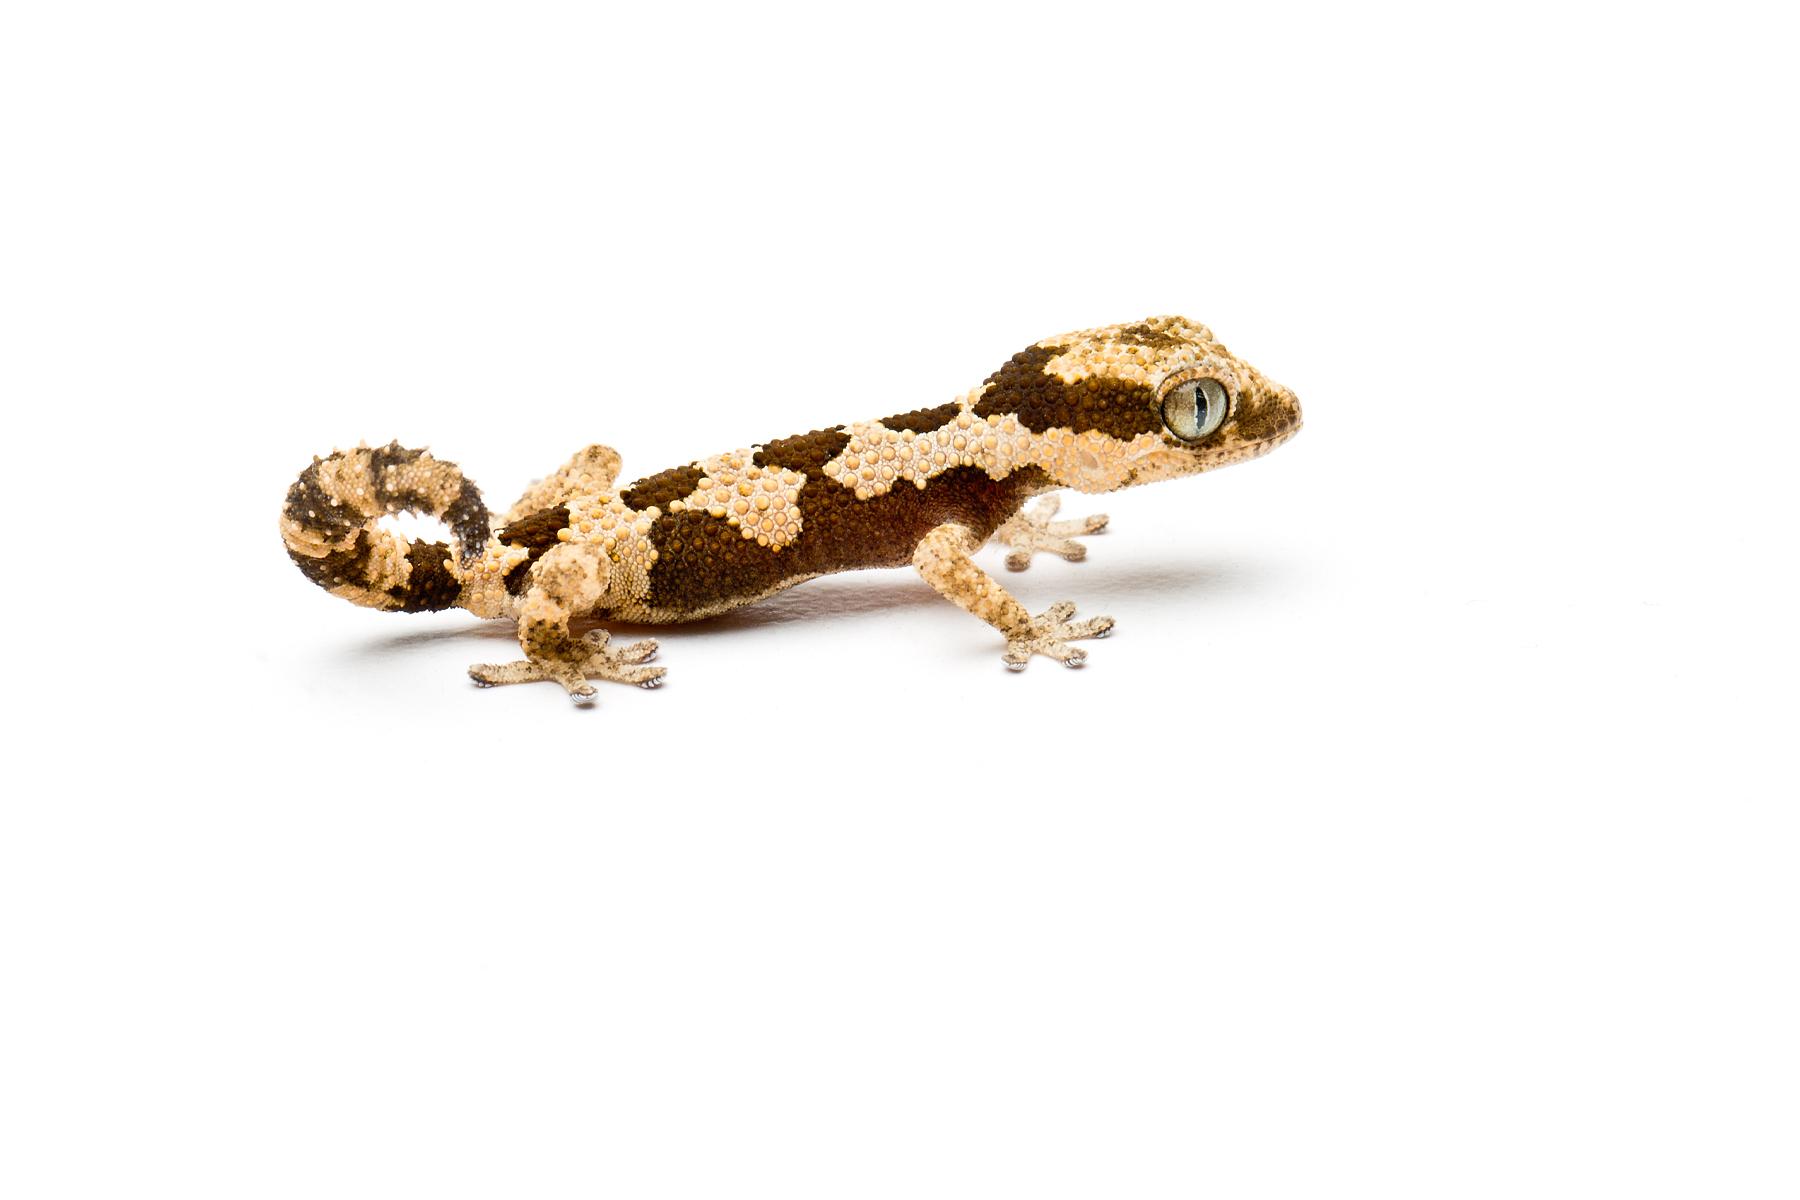 Hatchling Pachydactylus rugosus